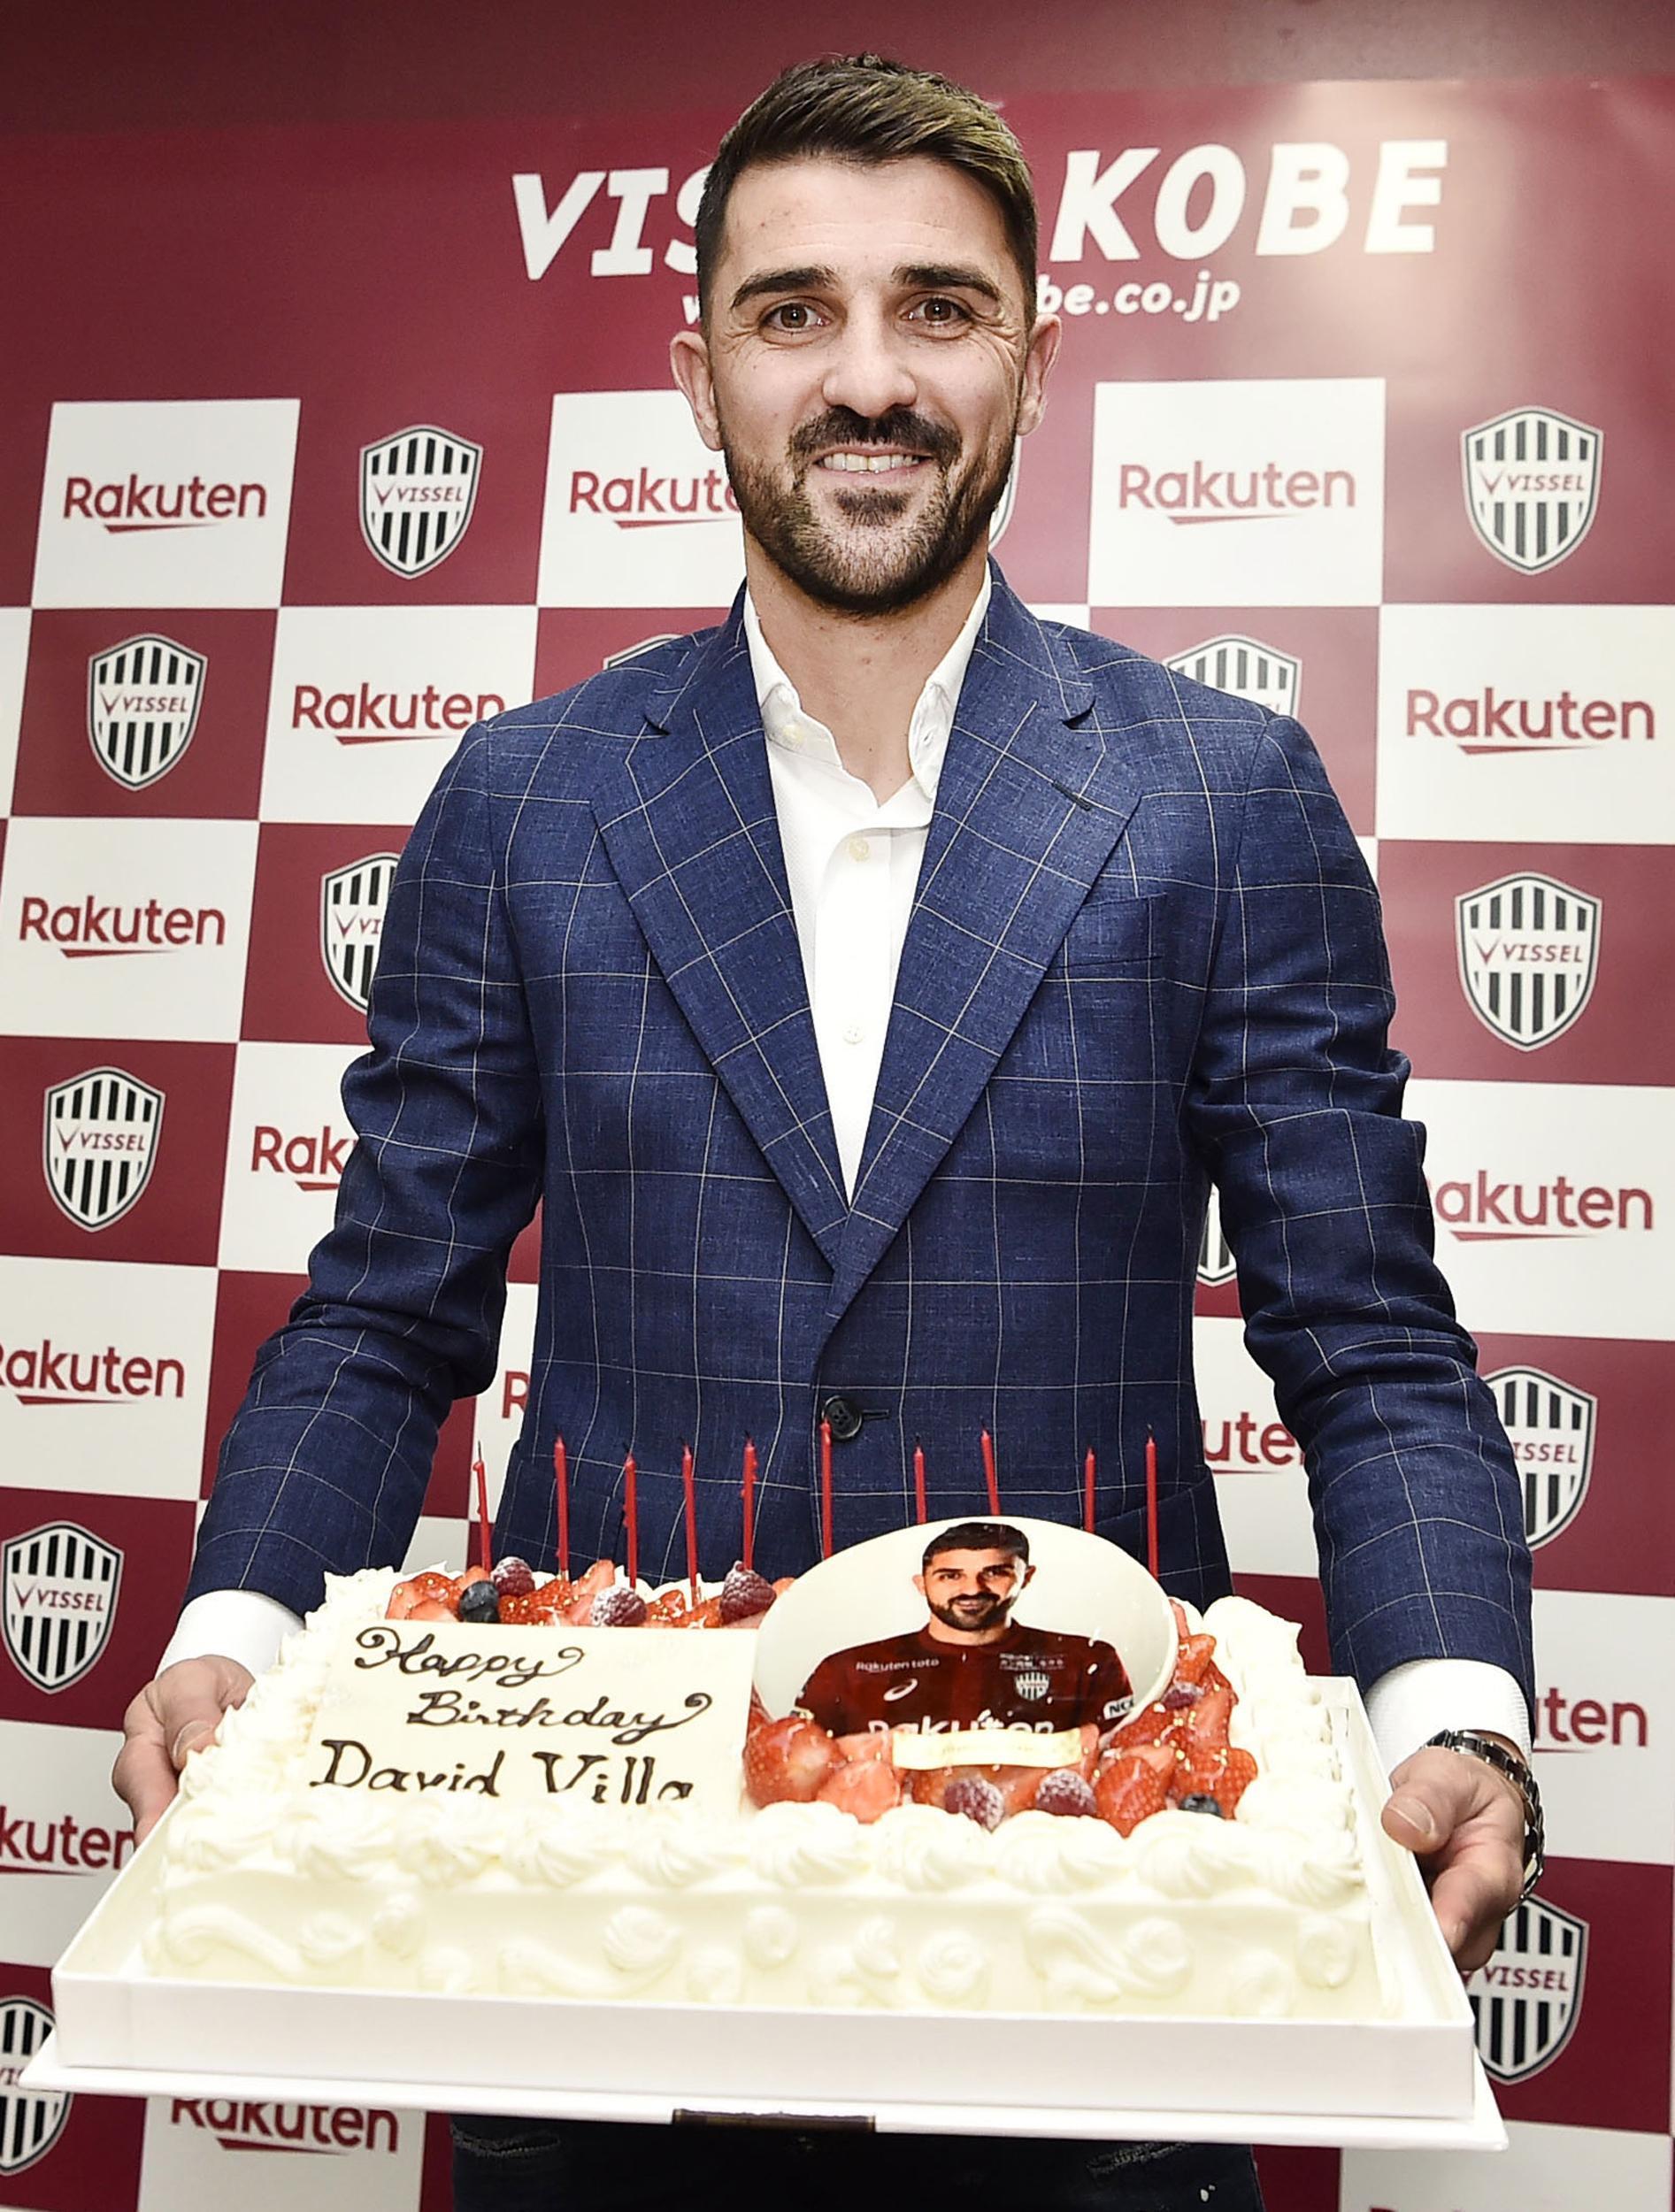 Anyone for Villa cake?